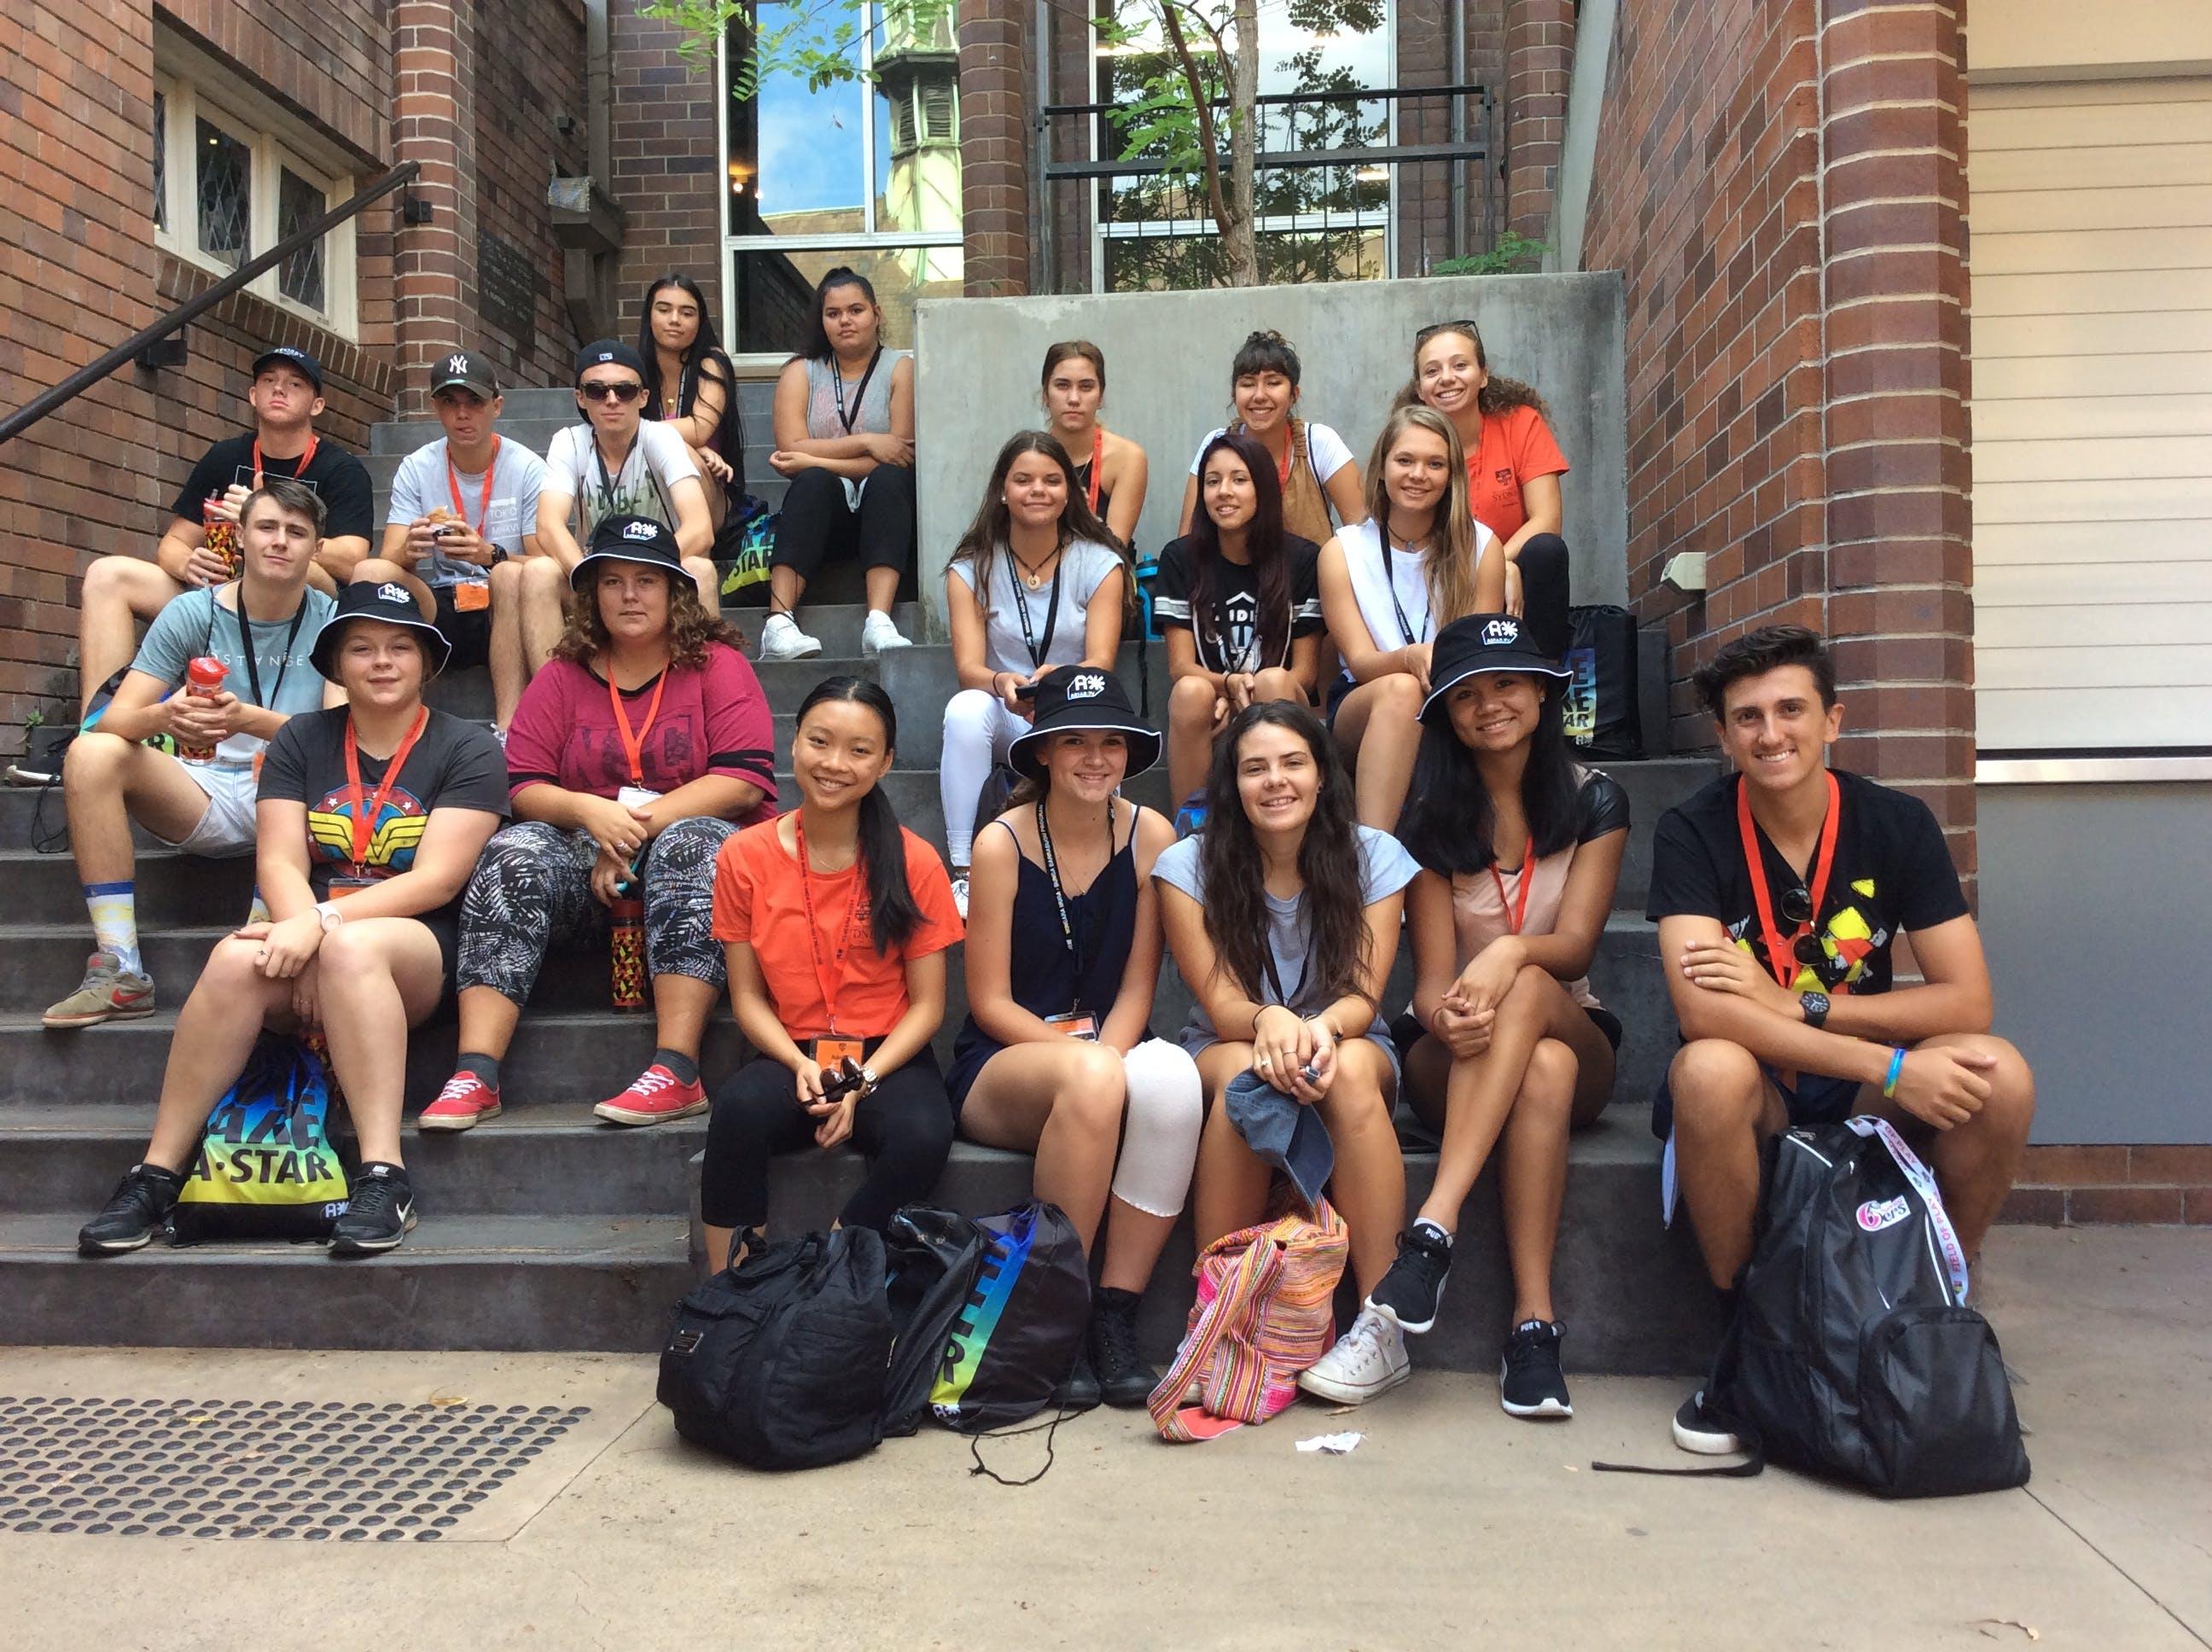 Adela Yip: 5 inspiring days as a Student Leader at #wmbb2017